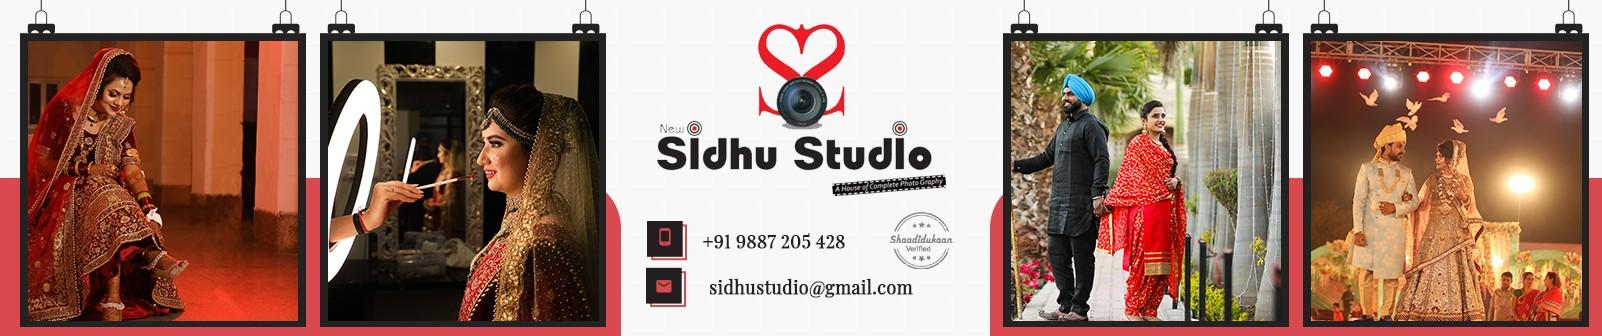 sidhu-studio